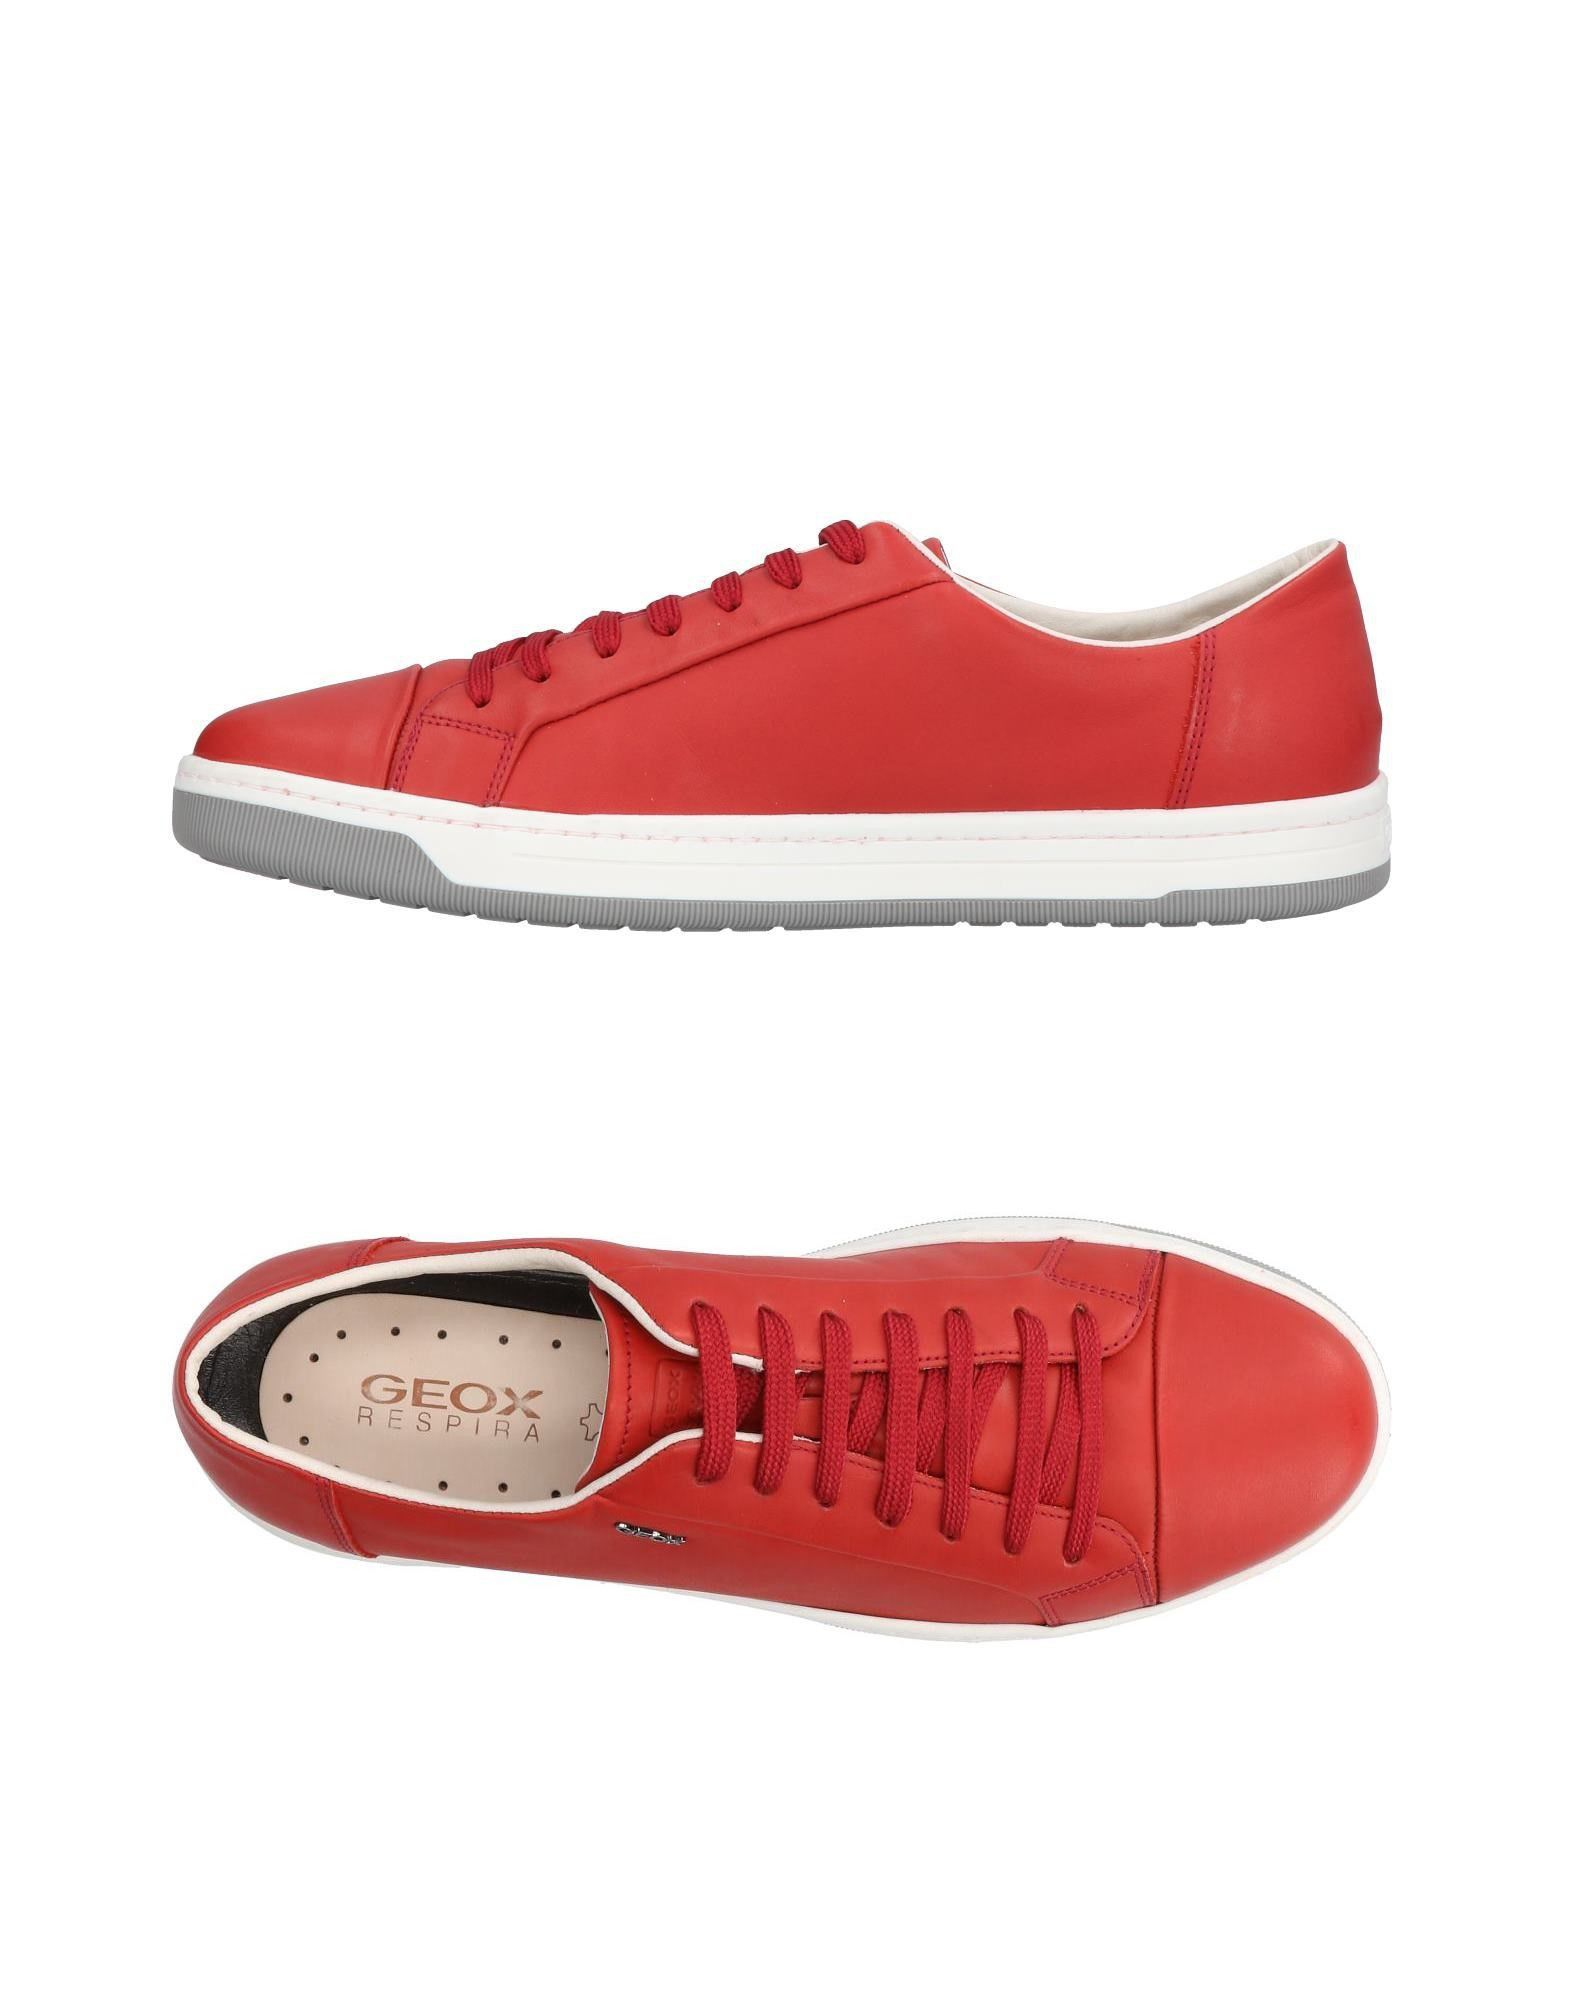 Sneakers Geox Homme - Sneakers Geox  Rouge Confortable et belle